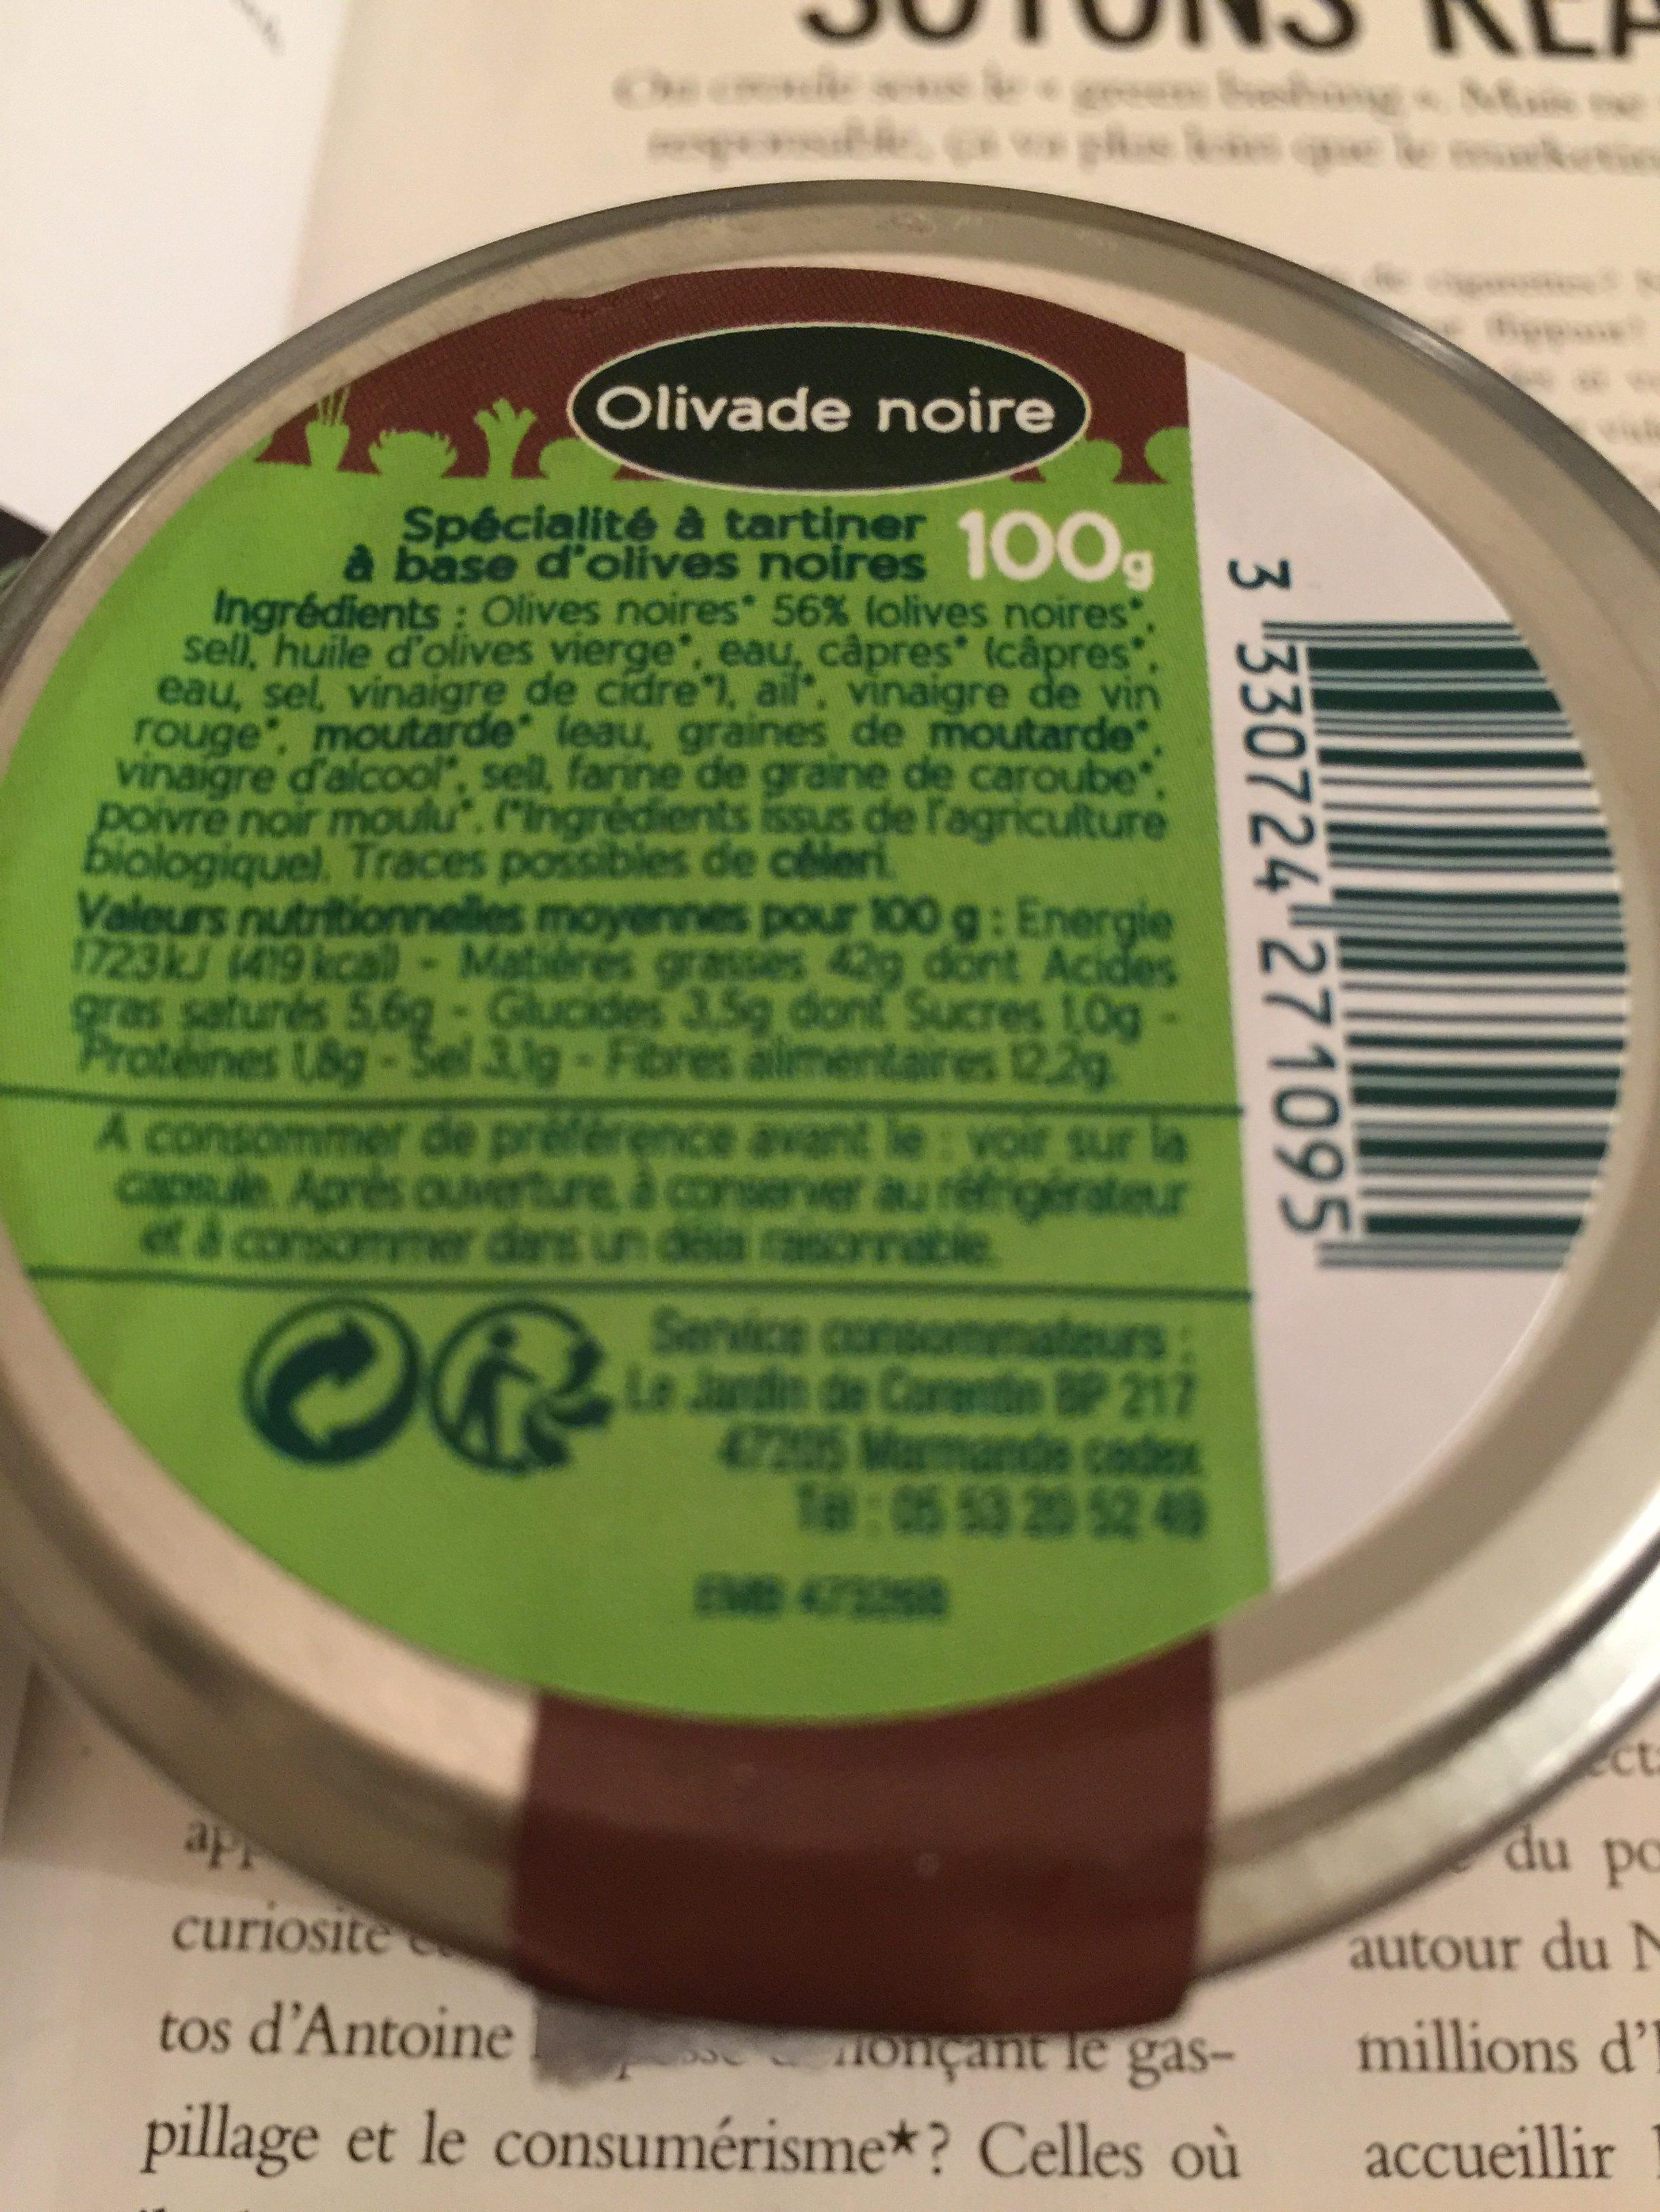 Olivade noire - Ingredients